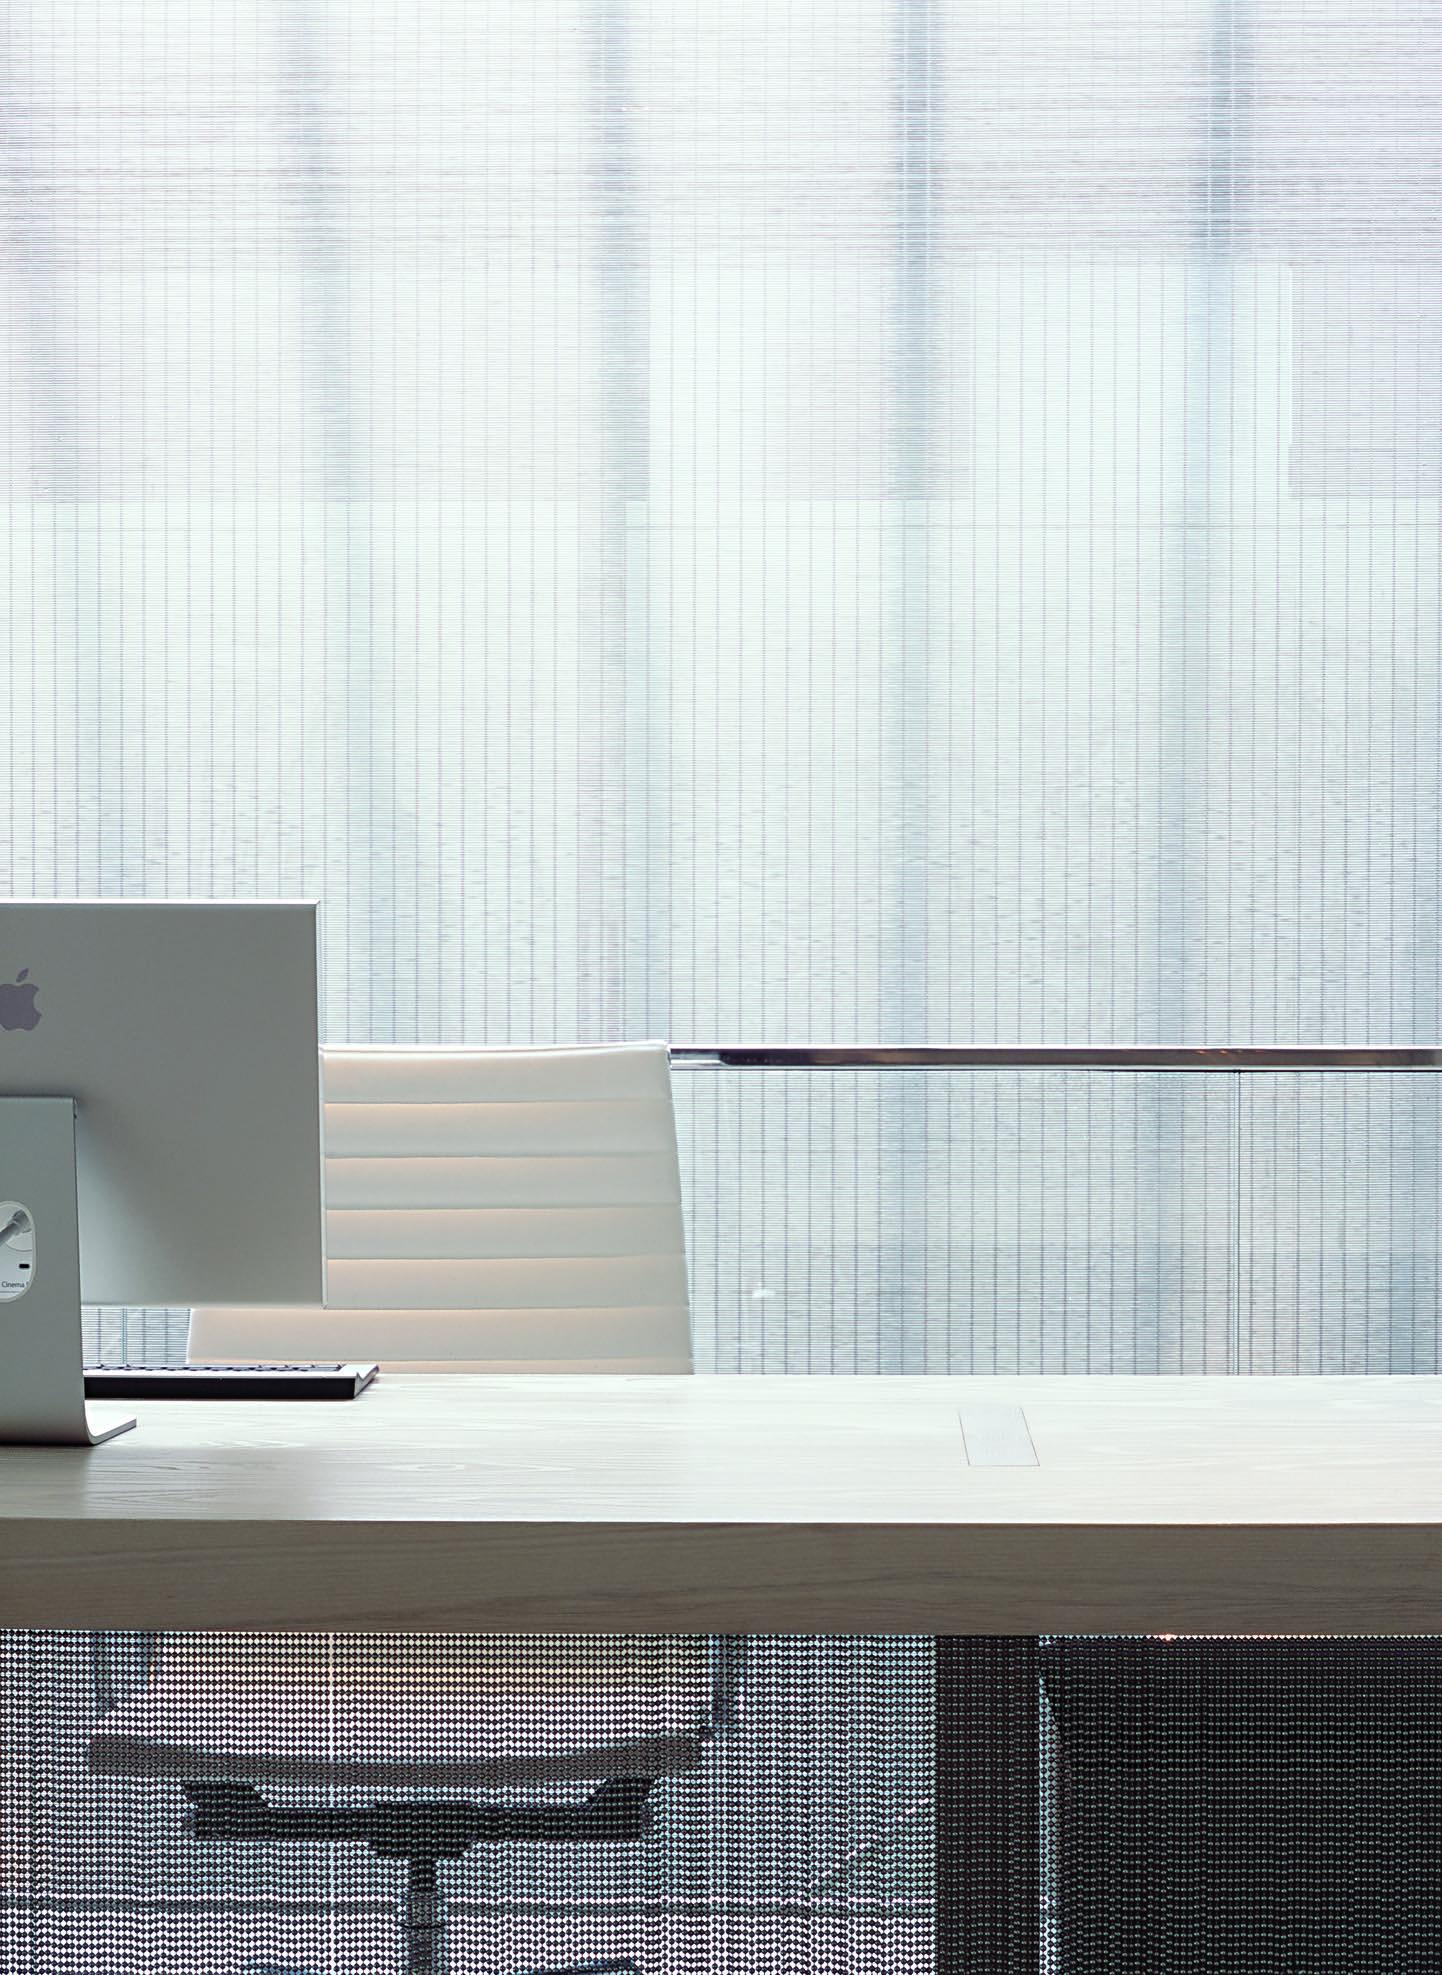 Theory-Office-Commercial-Interior-Design-JMorrisDesign-Brooklyn-Interior-Designer.jpg